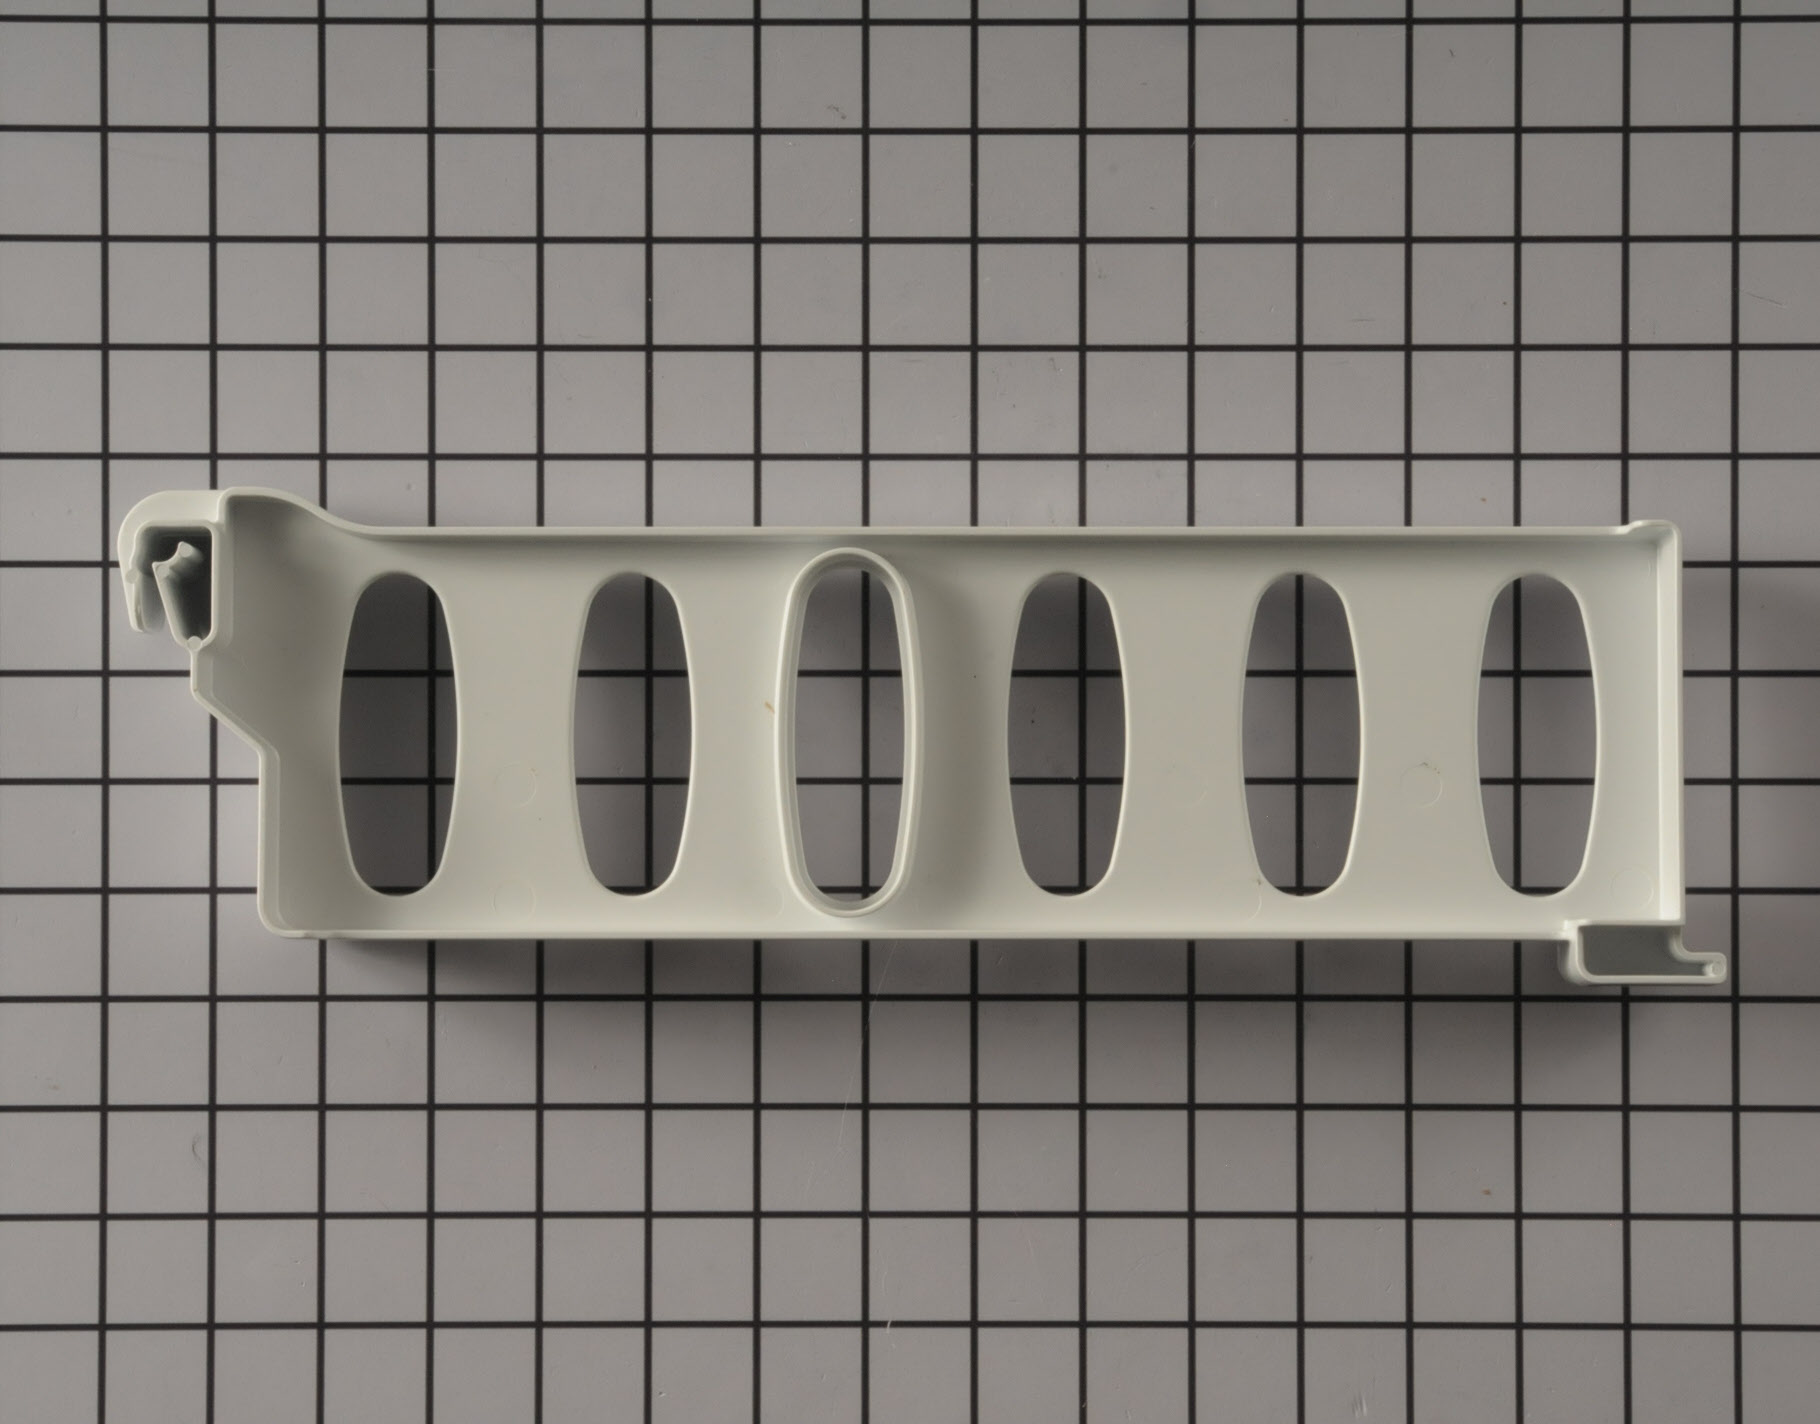 Kenmore Refrigerator Part # W10241046 - Wire Shelf